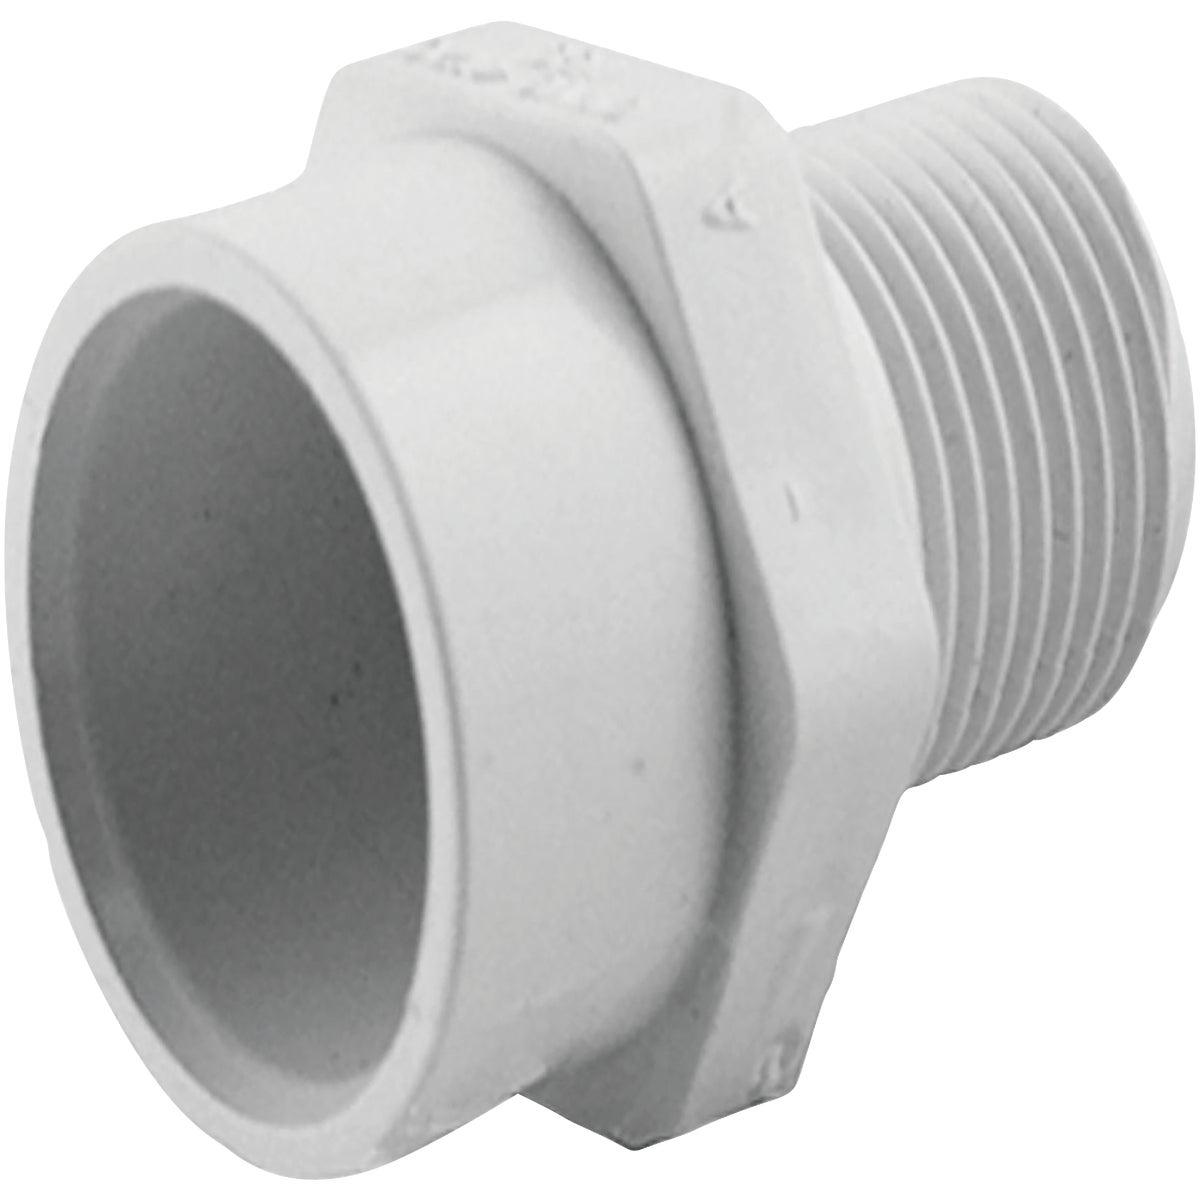 3/4X1/2 CPVC MIP ADAPTER - 50475 by Genova Inc